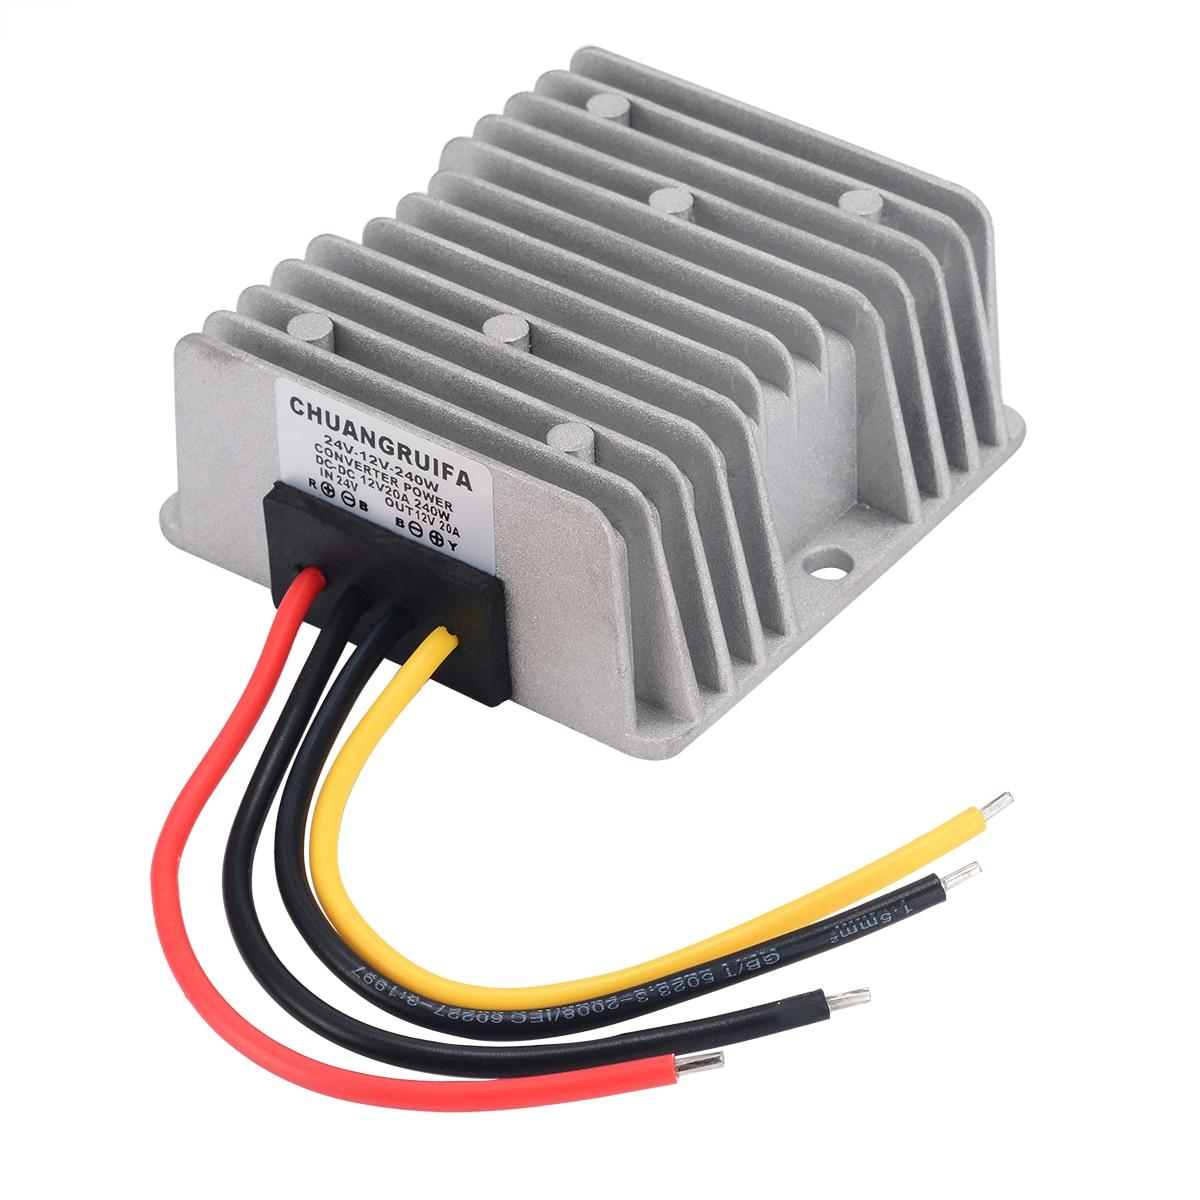 Aluminium Car Power Supply  DC 24V to 12V 20A Max Voltage Converter